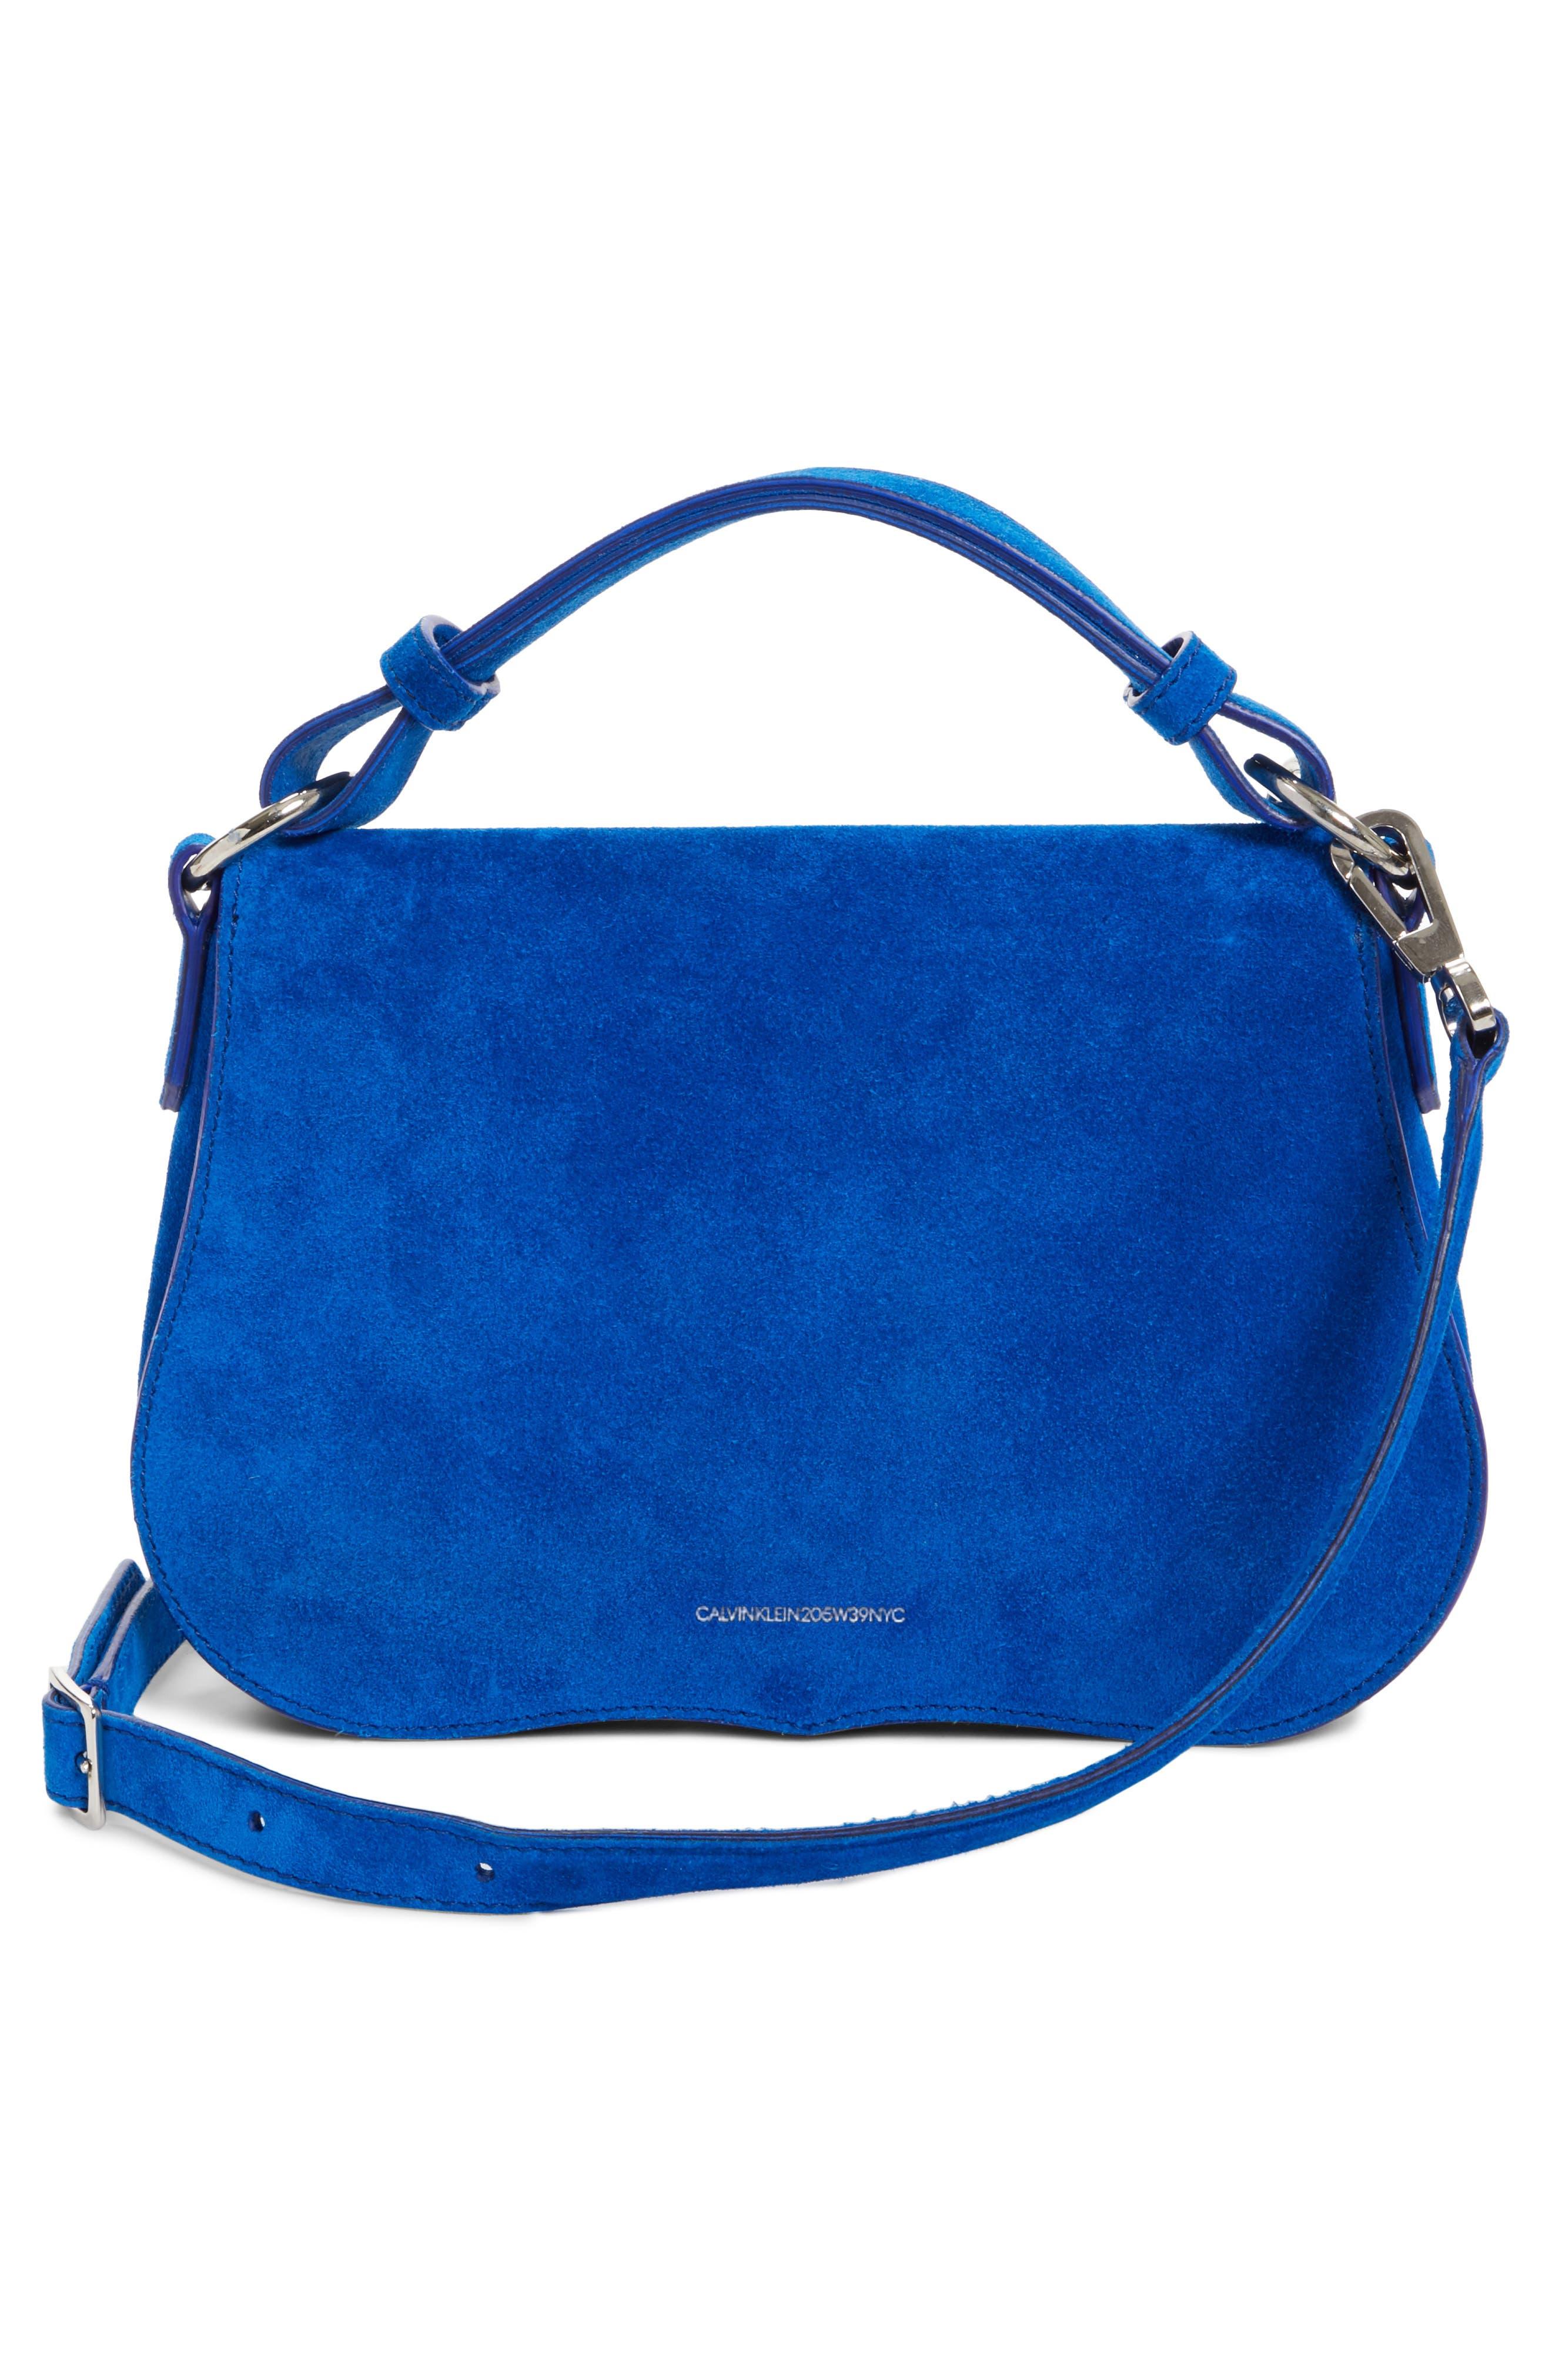 Alternate Image 3  - CALVIN KLEIN 205W39NYC Small Suede Shoulder Bag